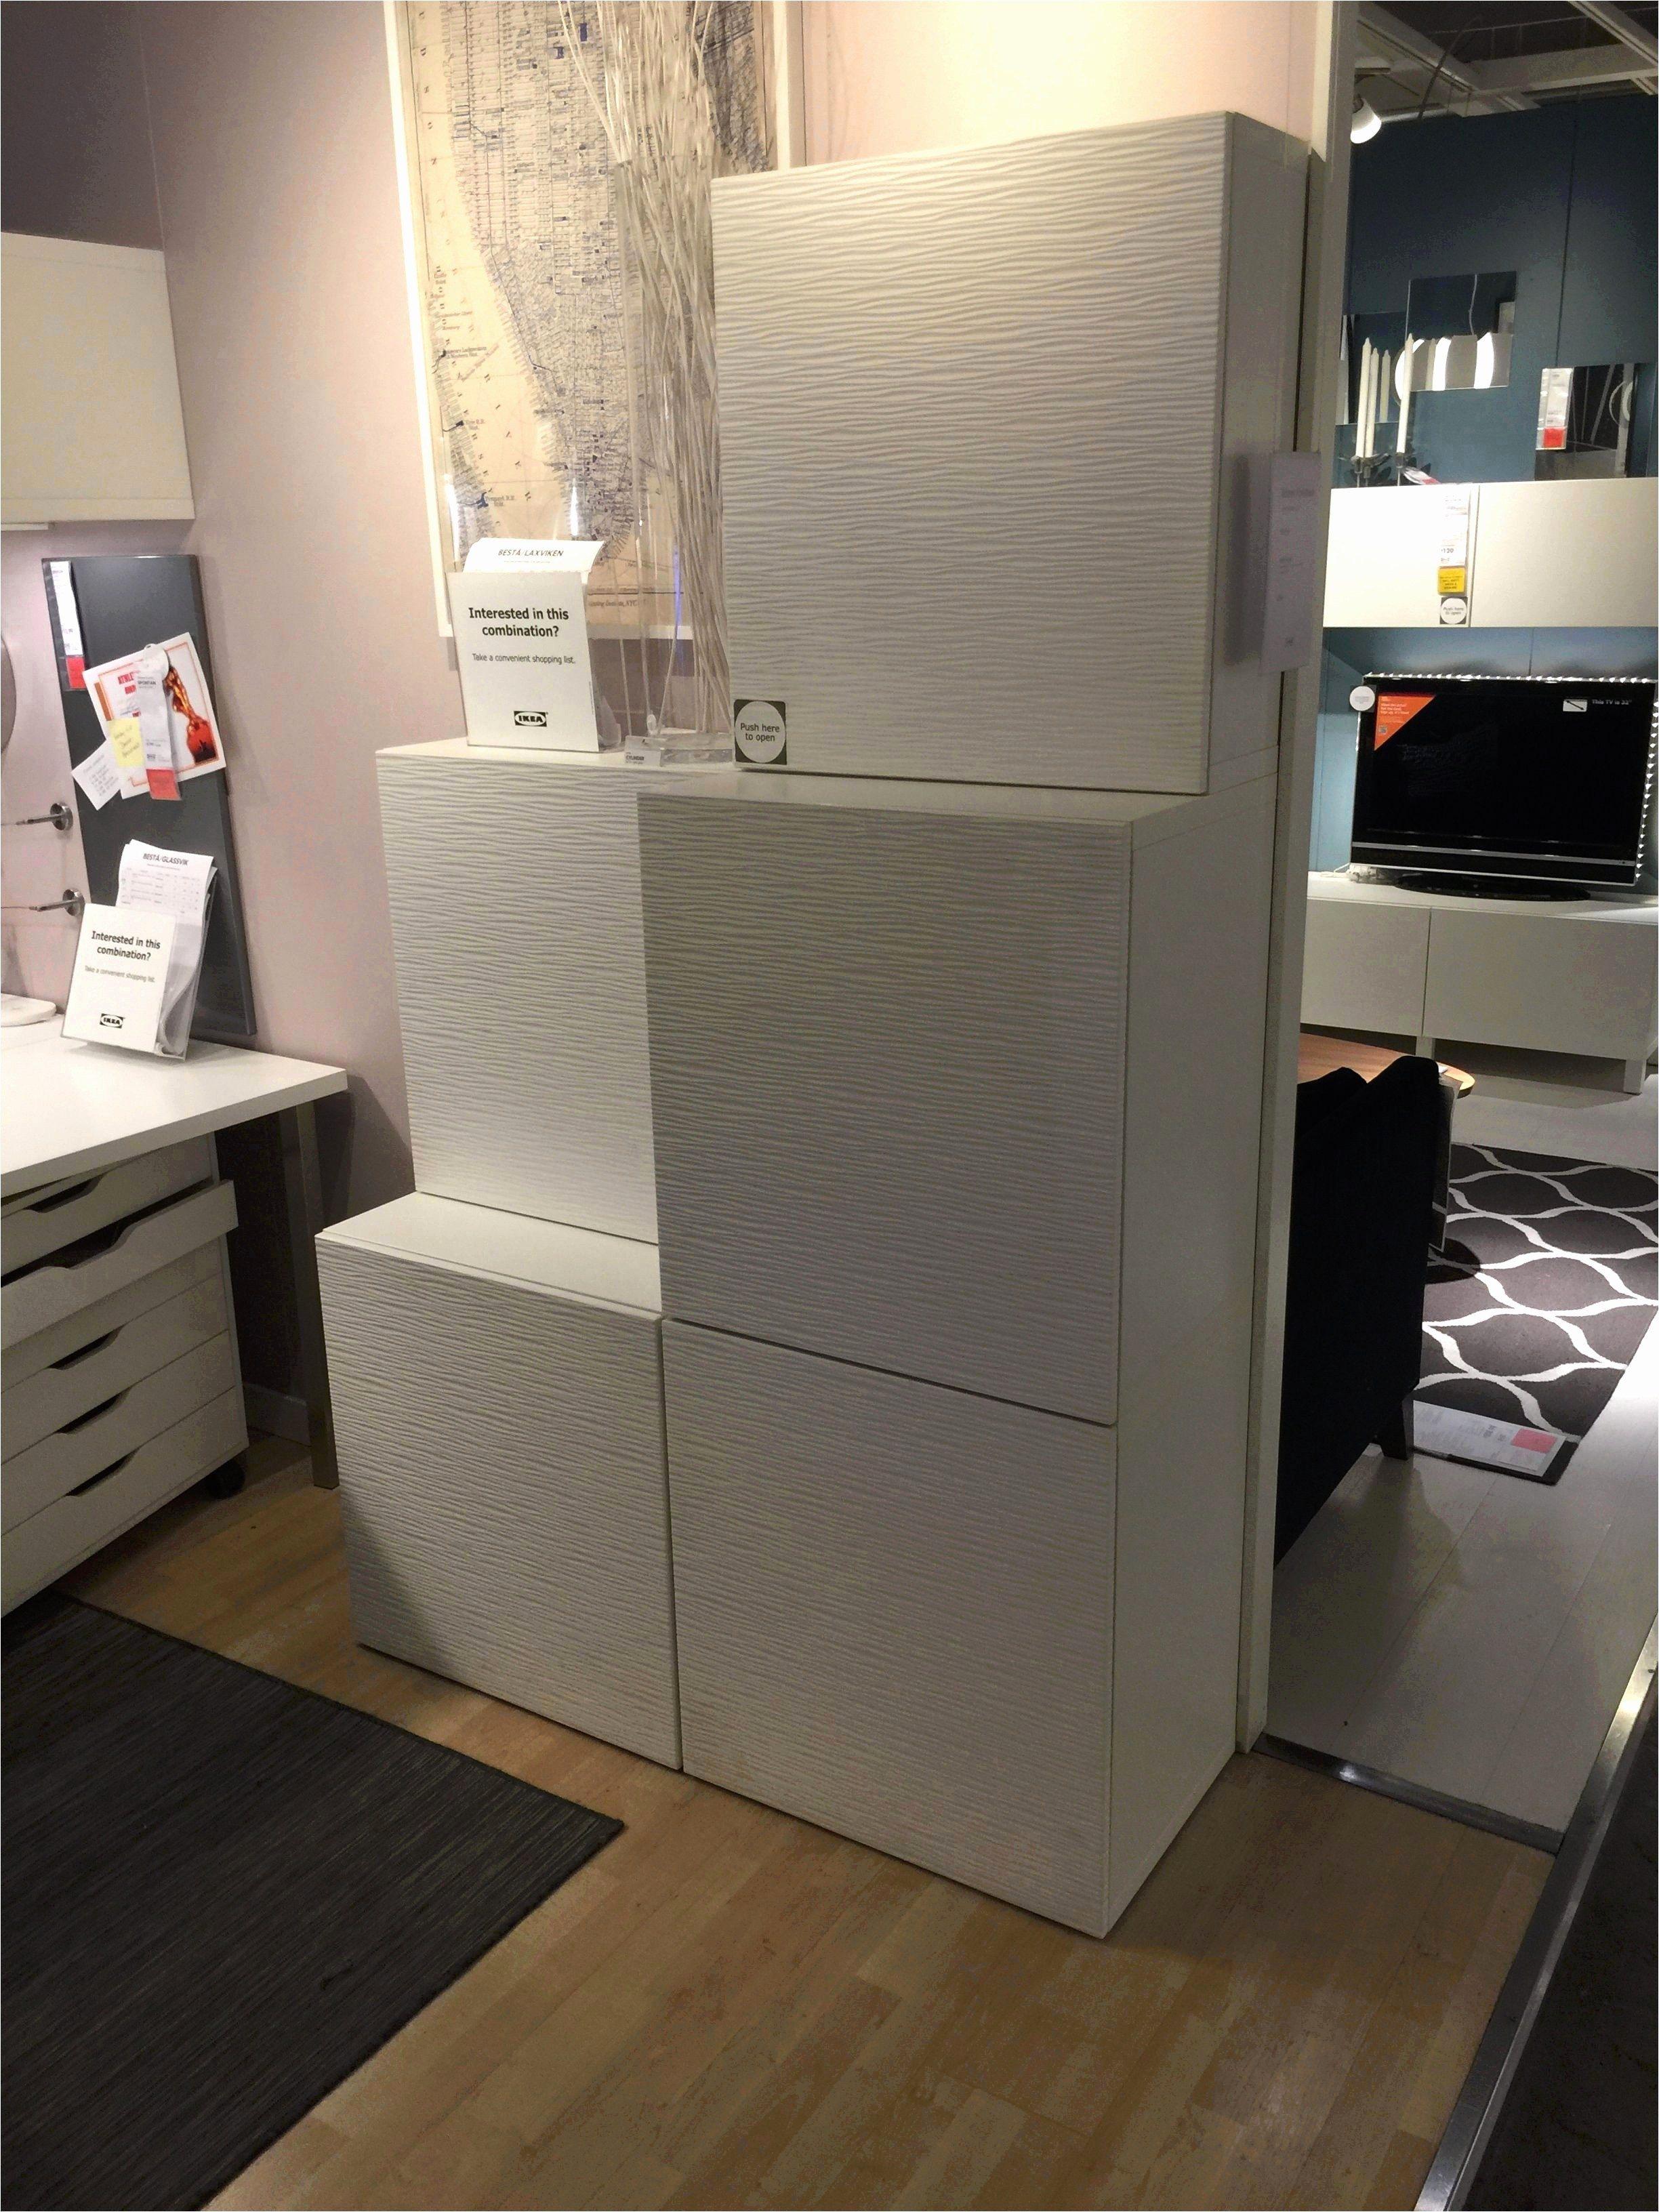 31 Luxe Lit Escamotable Plafond Ikea Images